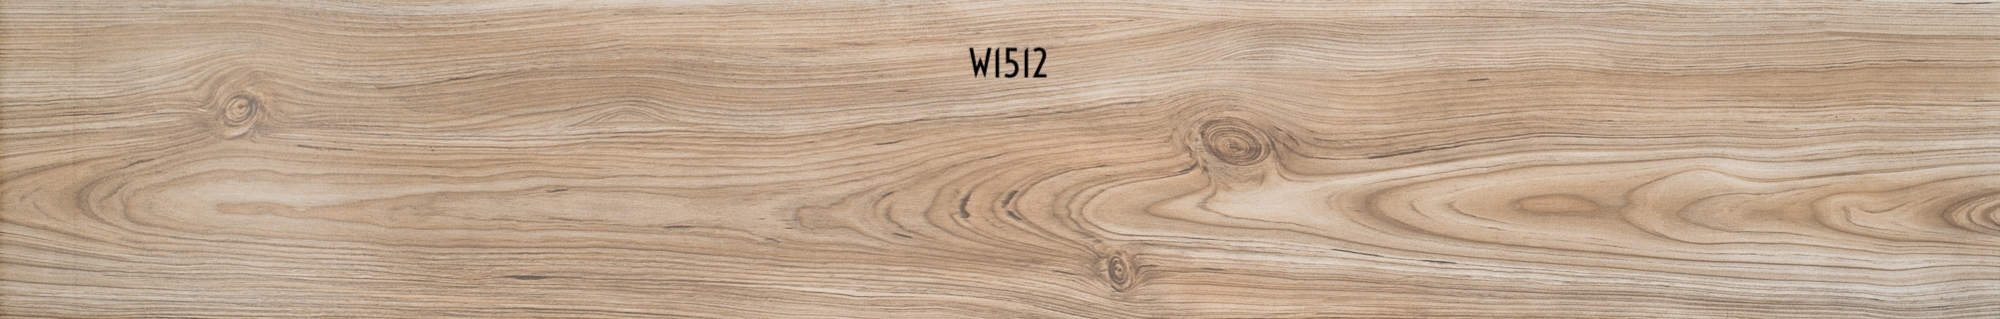 W1512